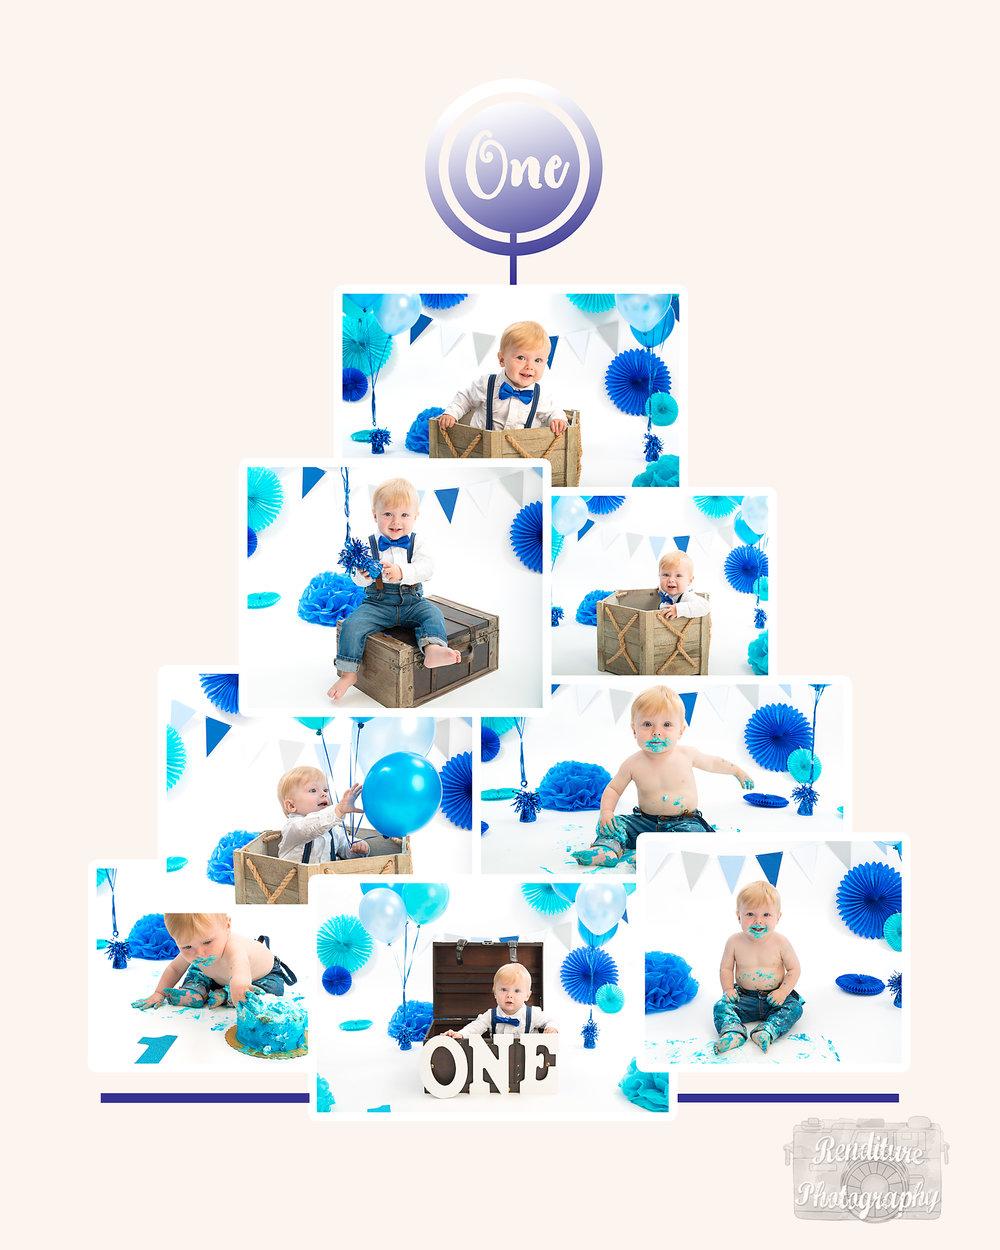 Saskatoon-Newborn-Family-Renditure-Baby-Photography-Photographer-Maternity-Pregnancy-Saskatchewan-408 FBR.jpg